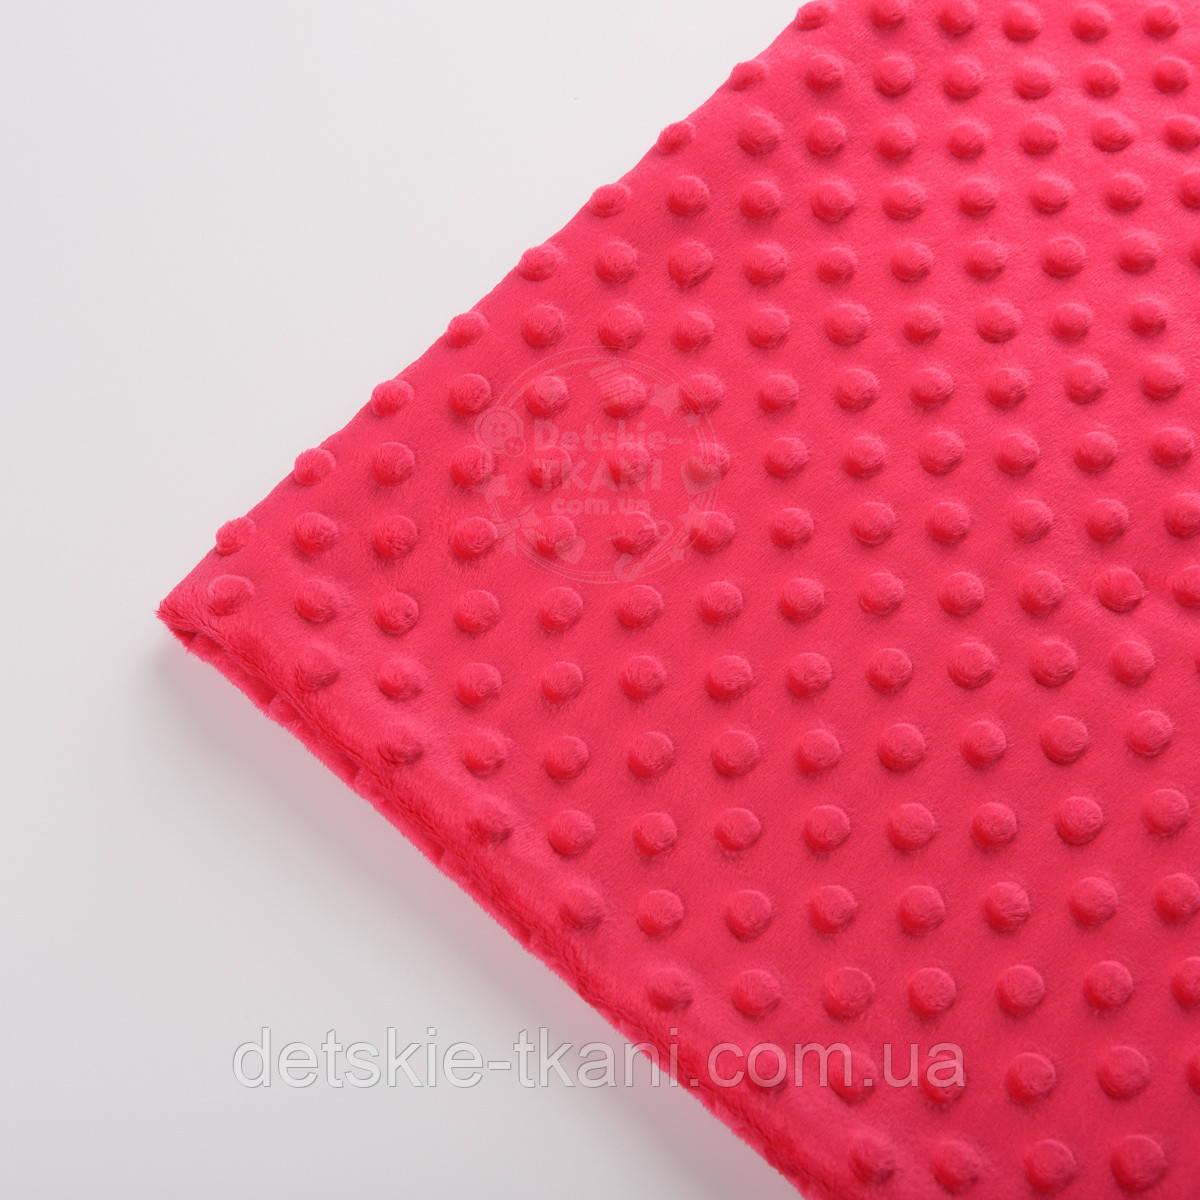 Отрез плюш minky М-14 размером 40*40 см малинового цвета